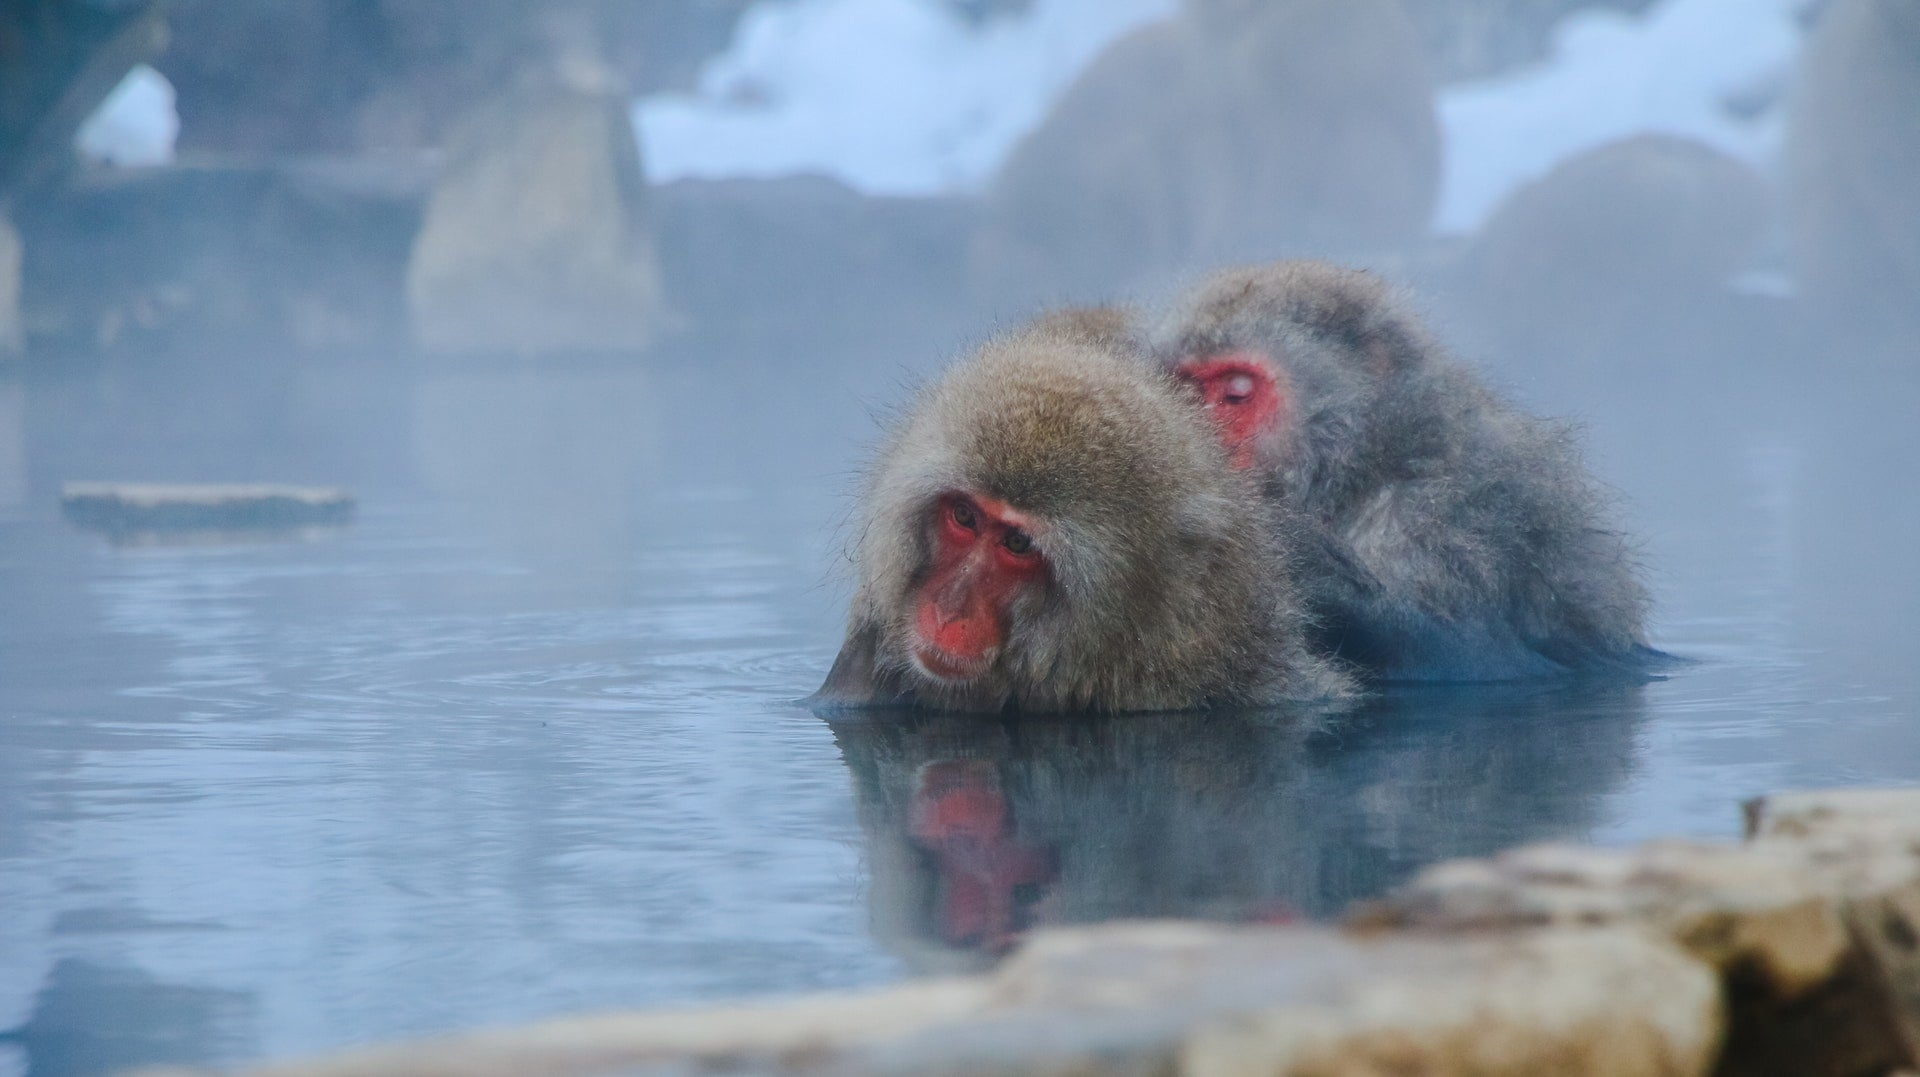 animal photography animals cute hairy hot spring monkey 樂桃航空「冬季泡湯樂♨️」促銷只要1280元輕鬆旅行雪國日本❄️優惠方案